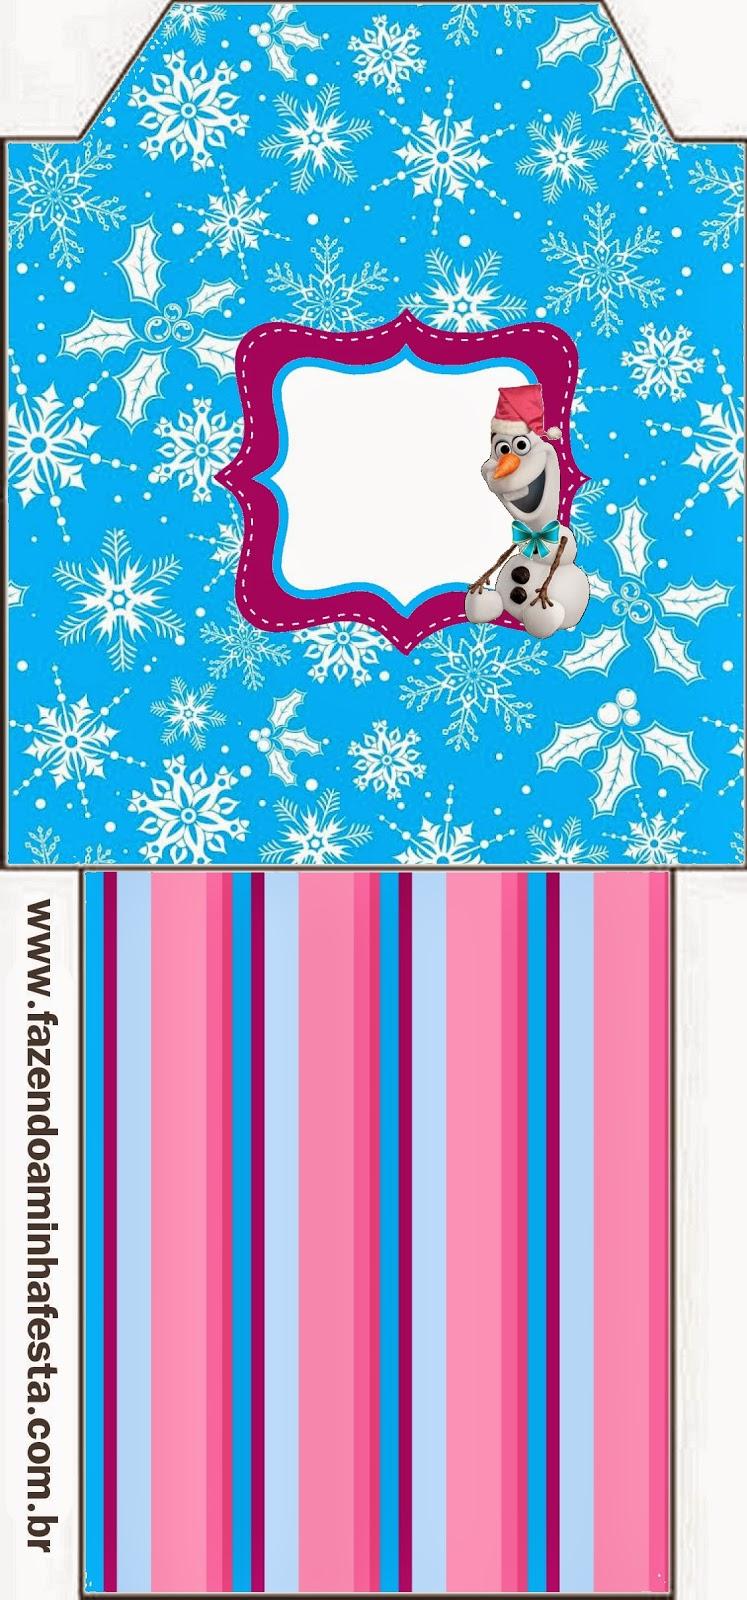 Bolsita de Té para imprimir gratis de Frozen para Navidad.